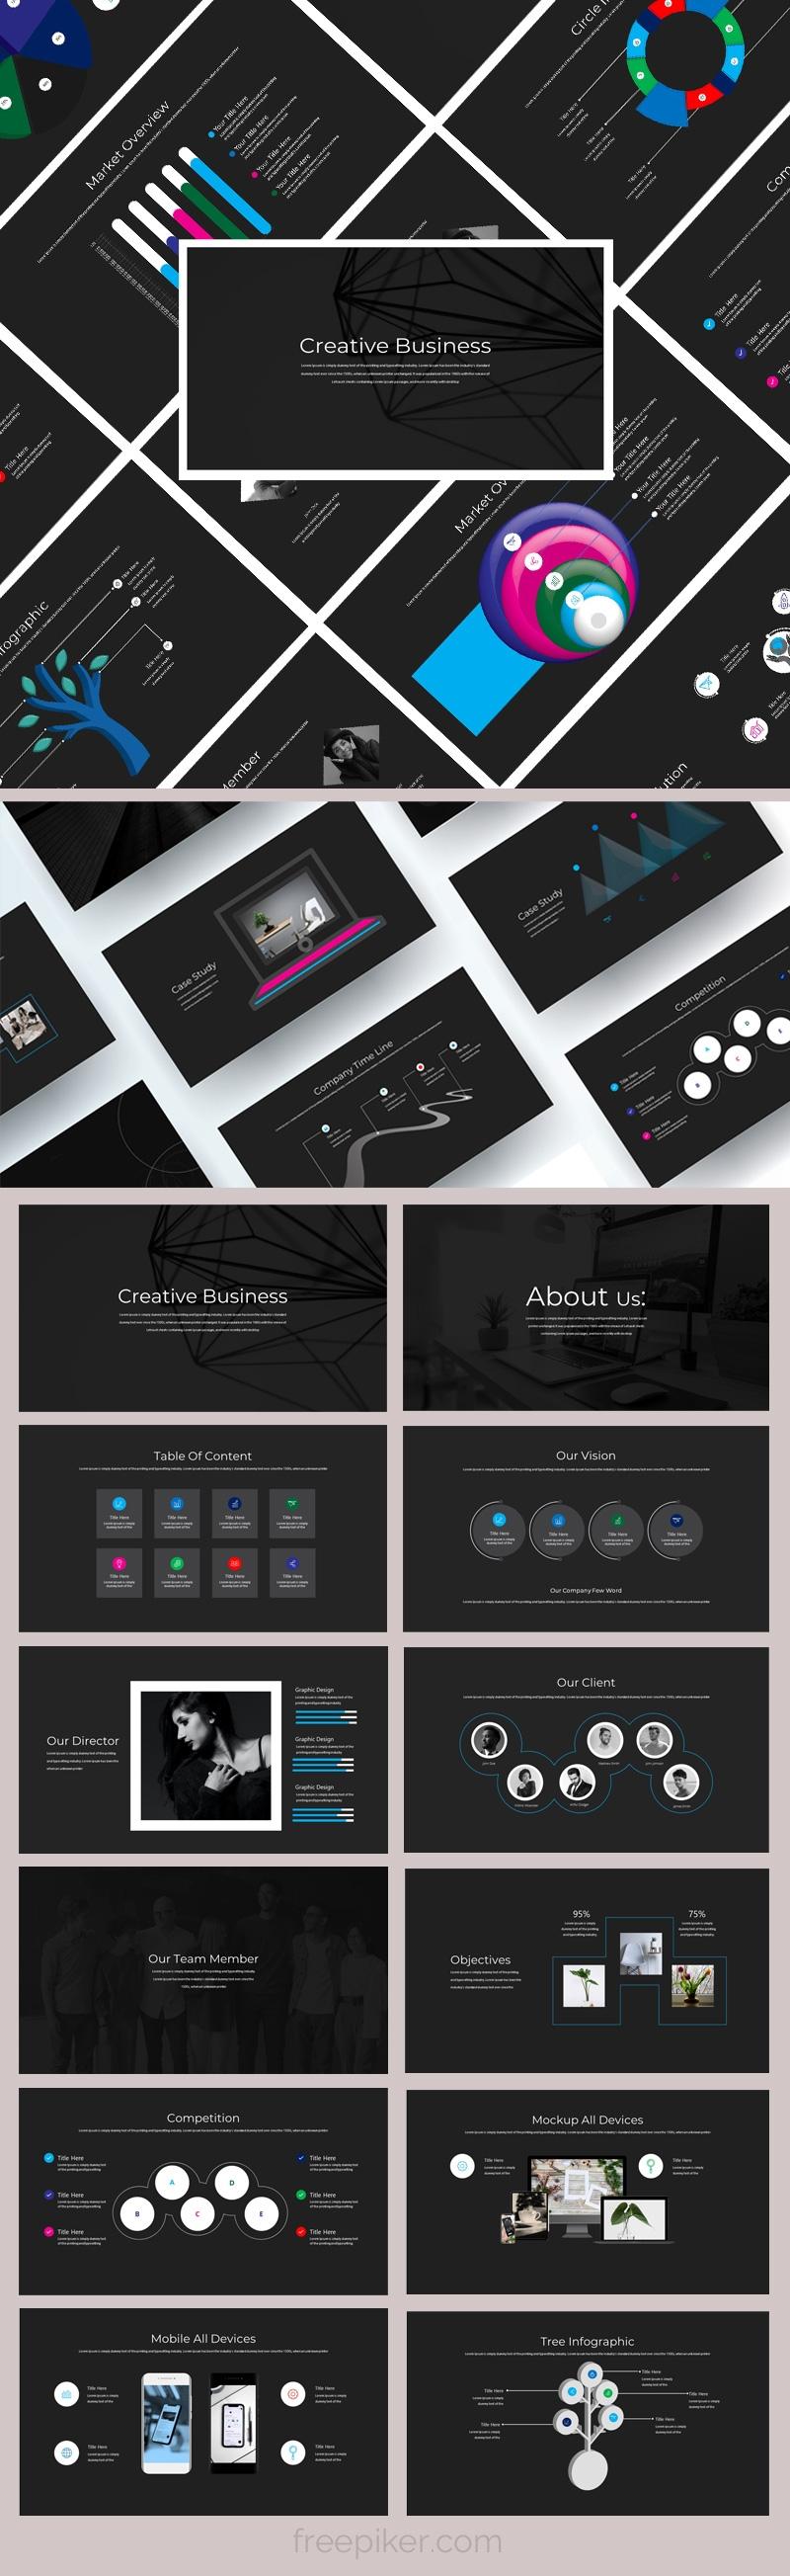 Creative Powerpoint PresentationTemplate